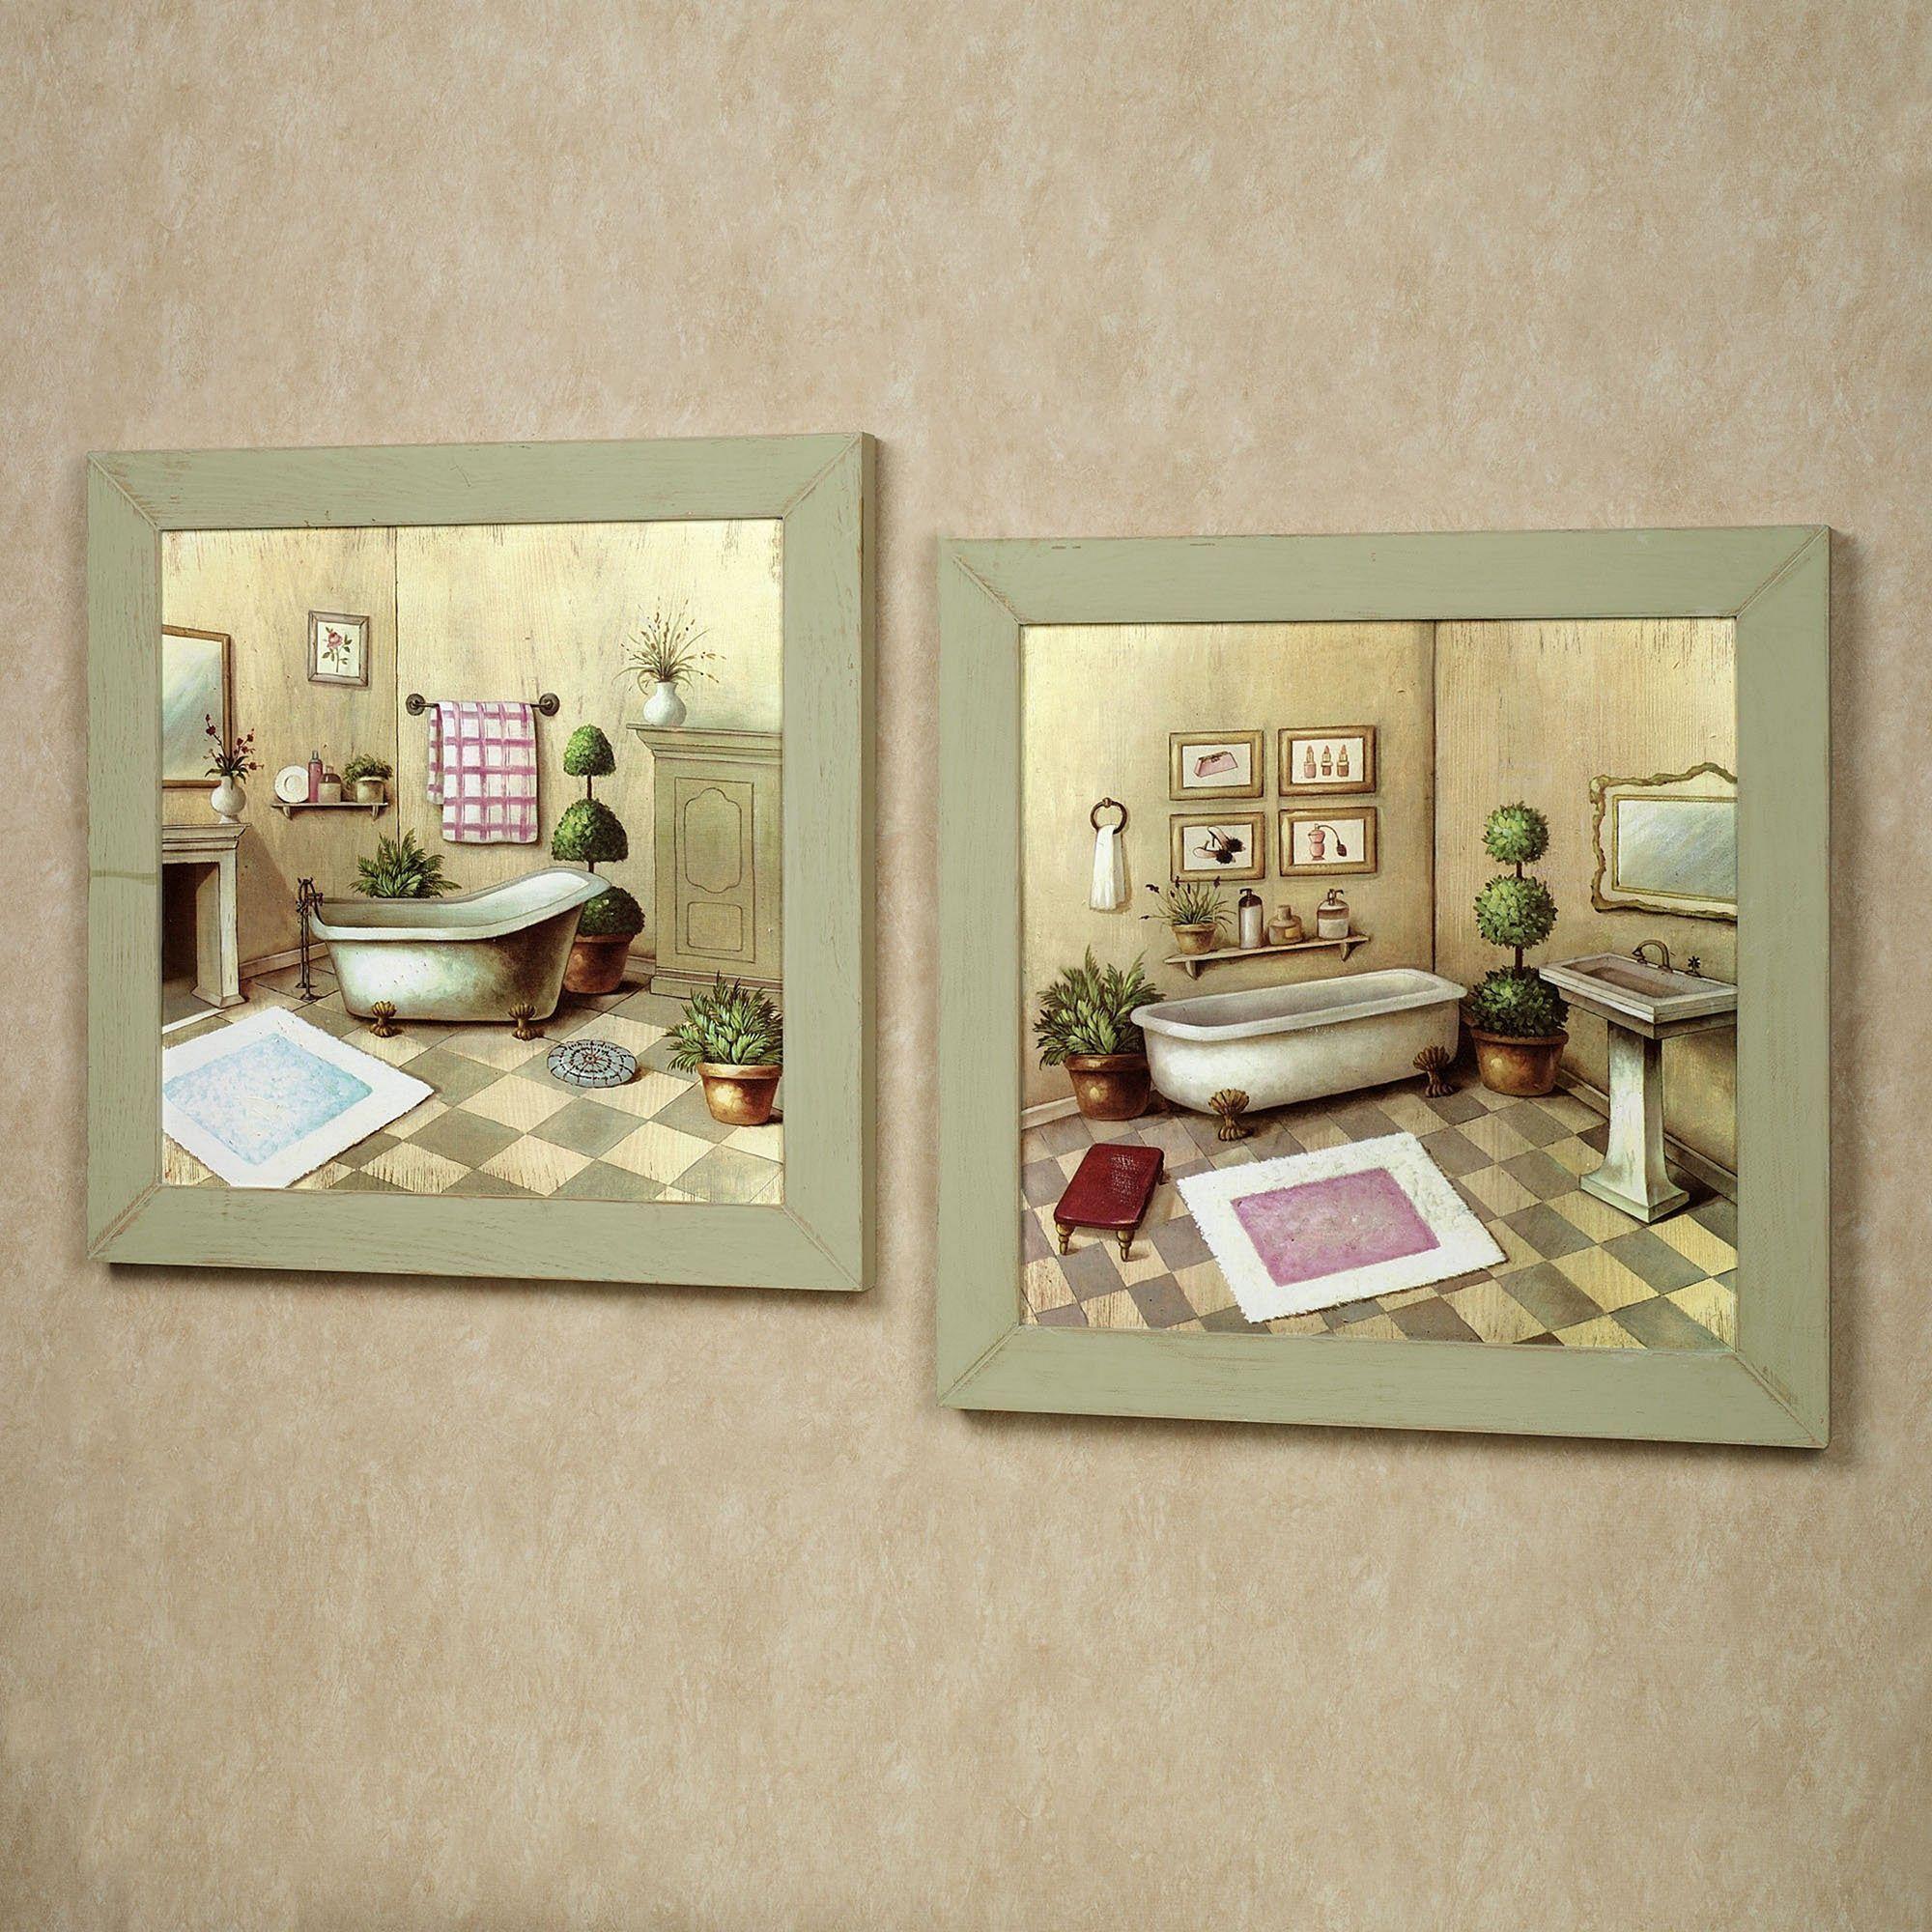 Inspiring Top 20 Elegant Bathroom Wall Decor For Cozy Bathroom